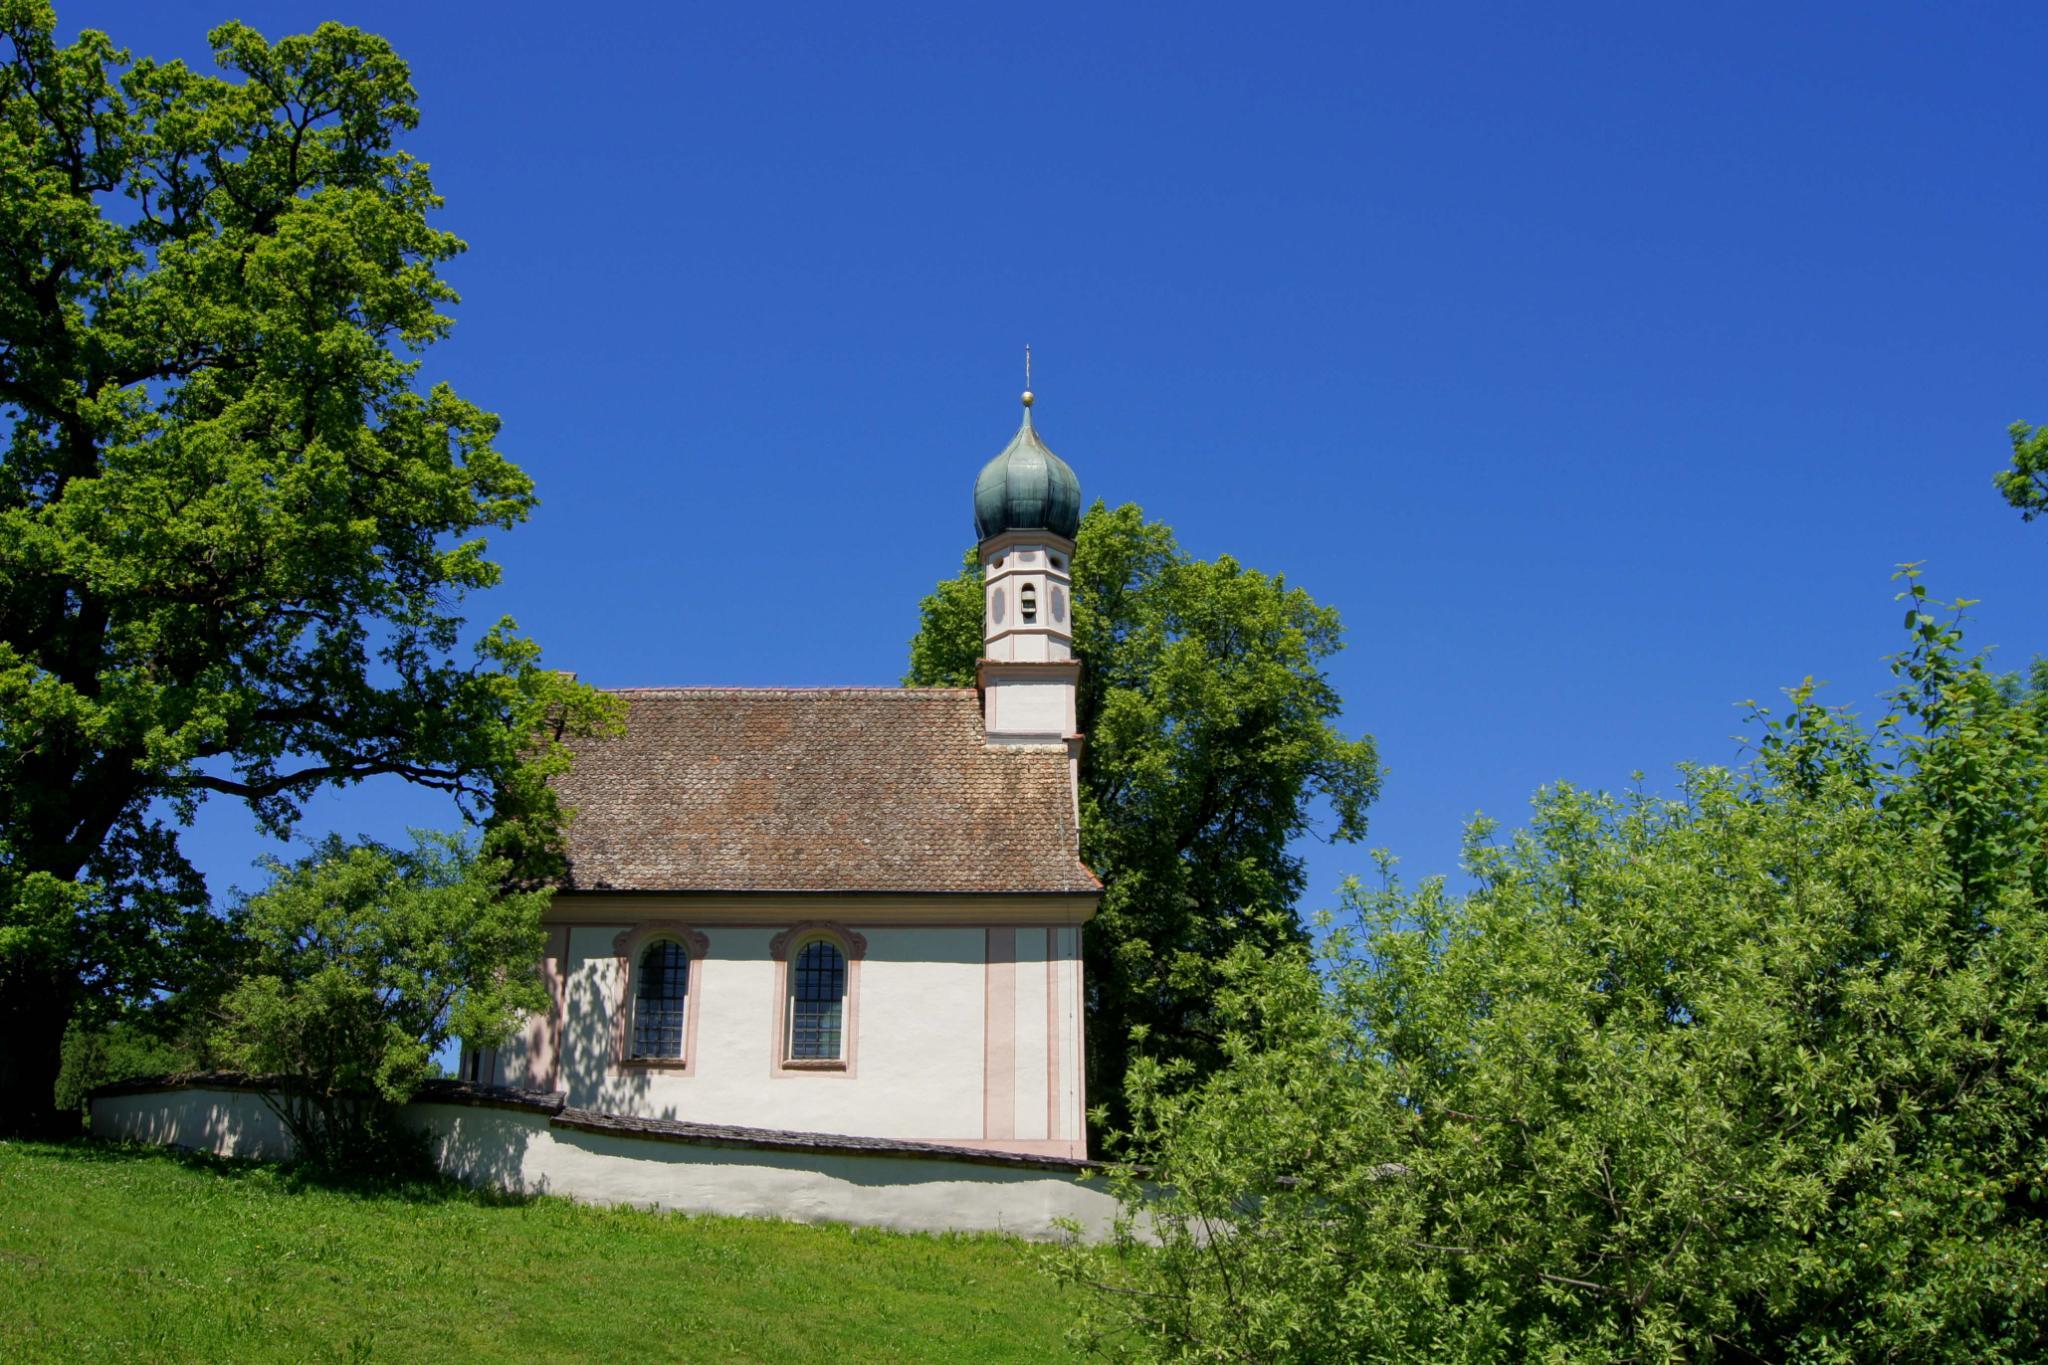 Geliebte Murnauer Moos • Wanderung » outdooractive.com @NF_96